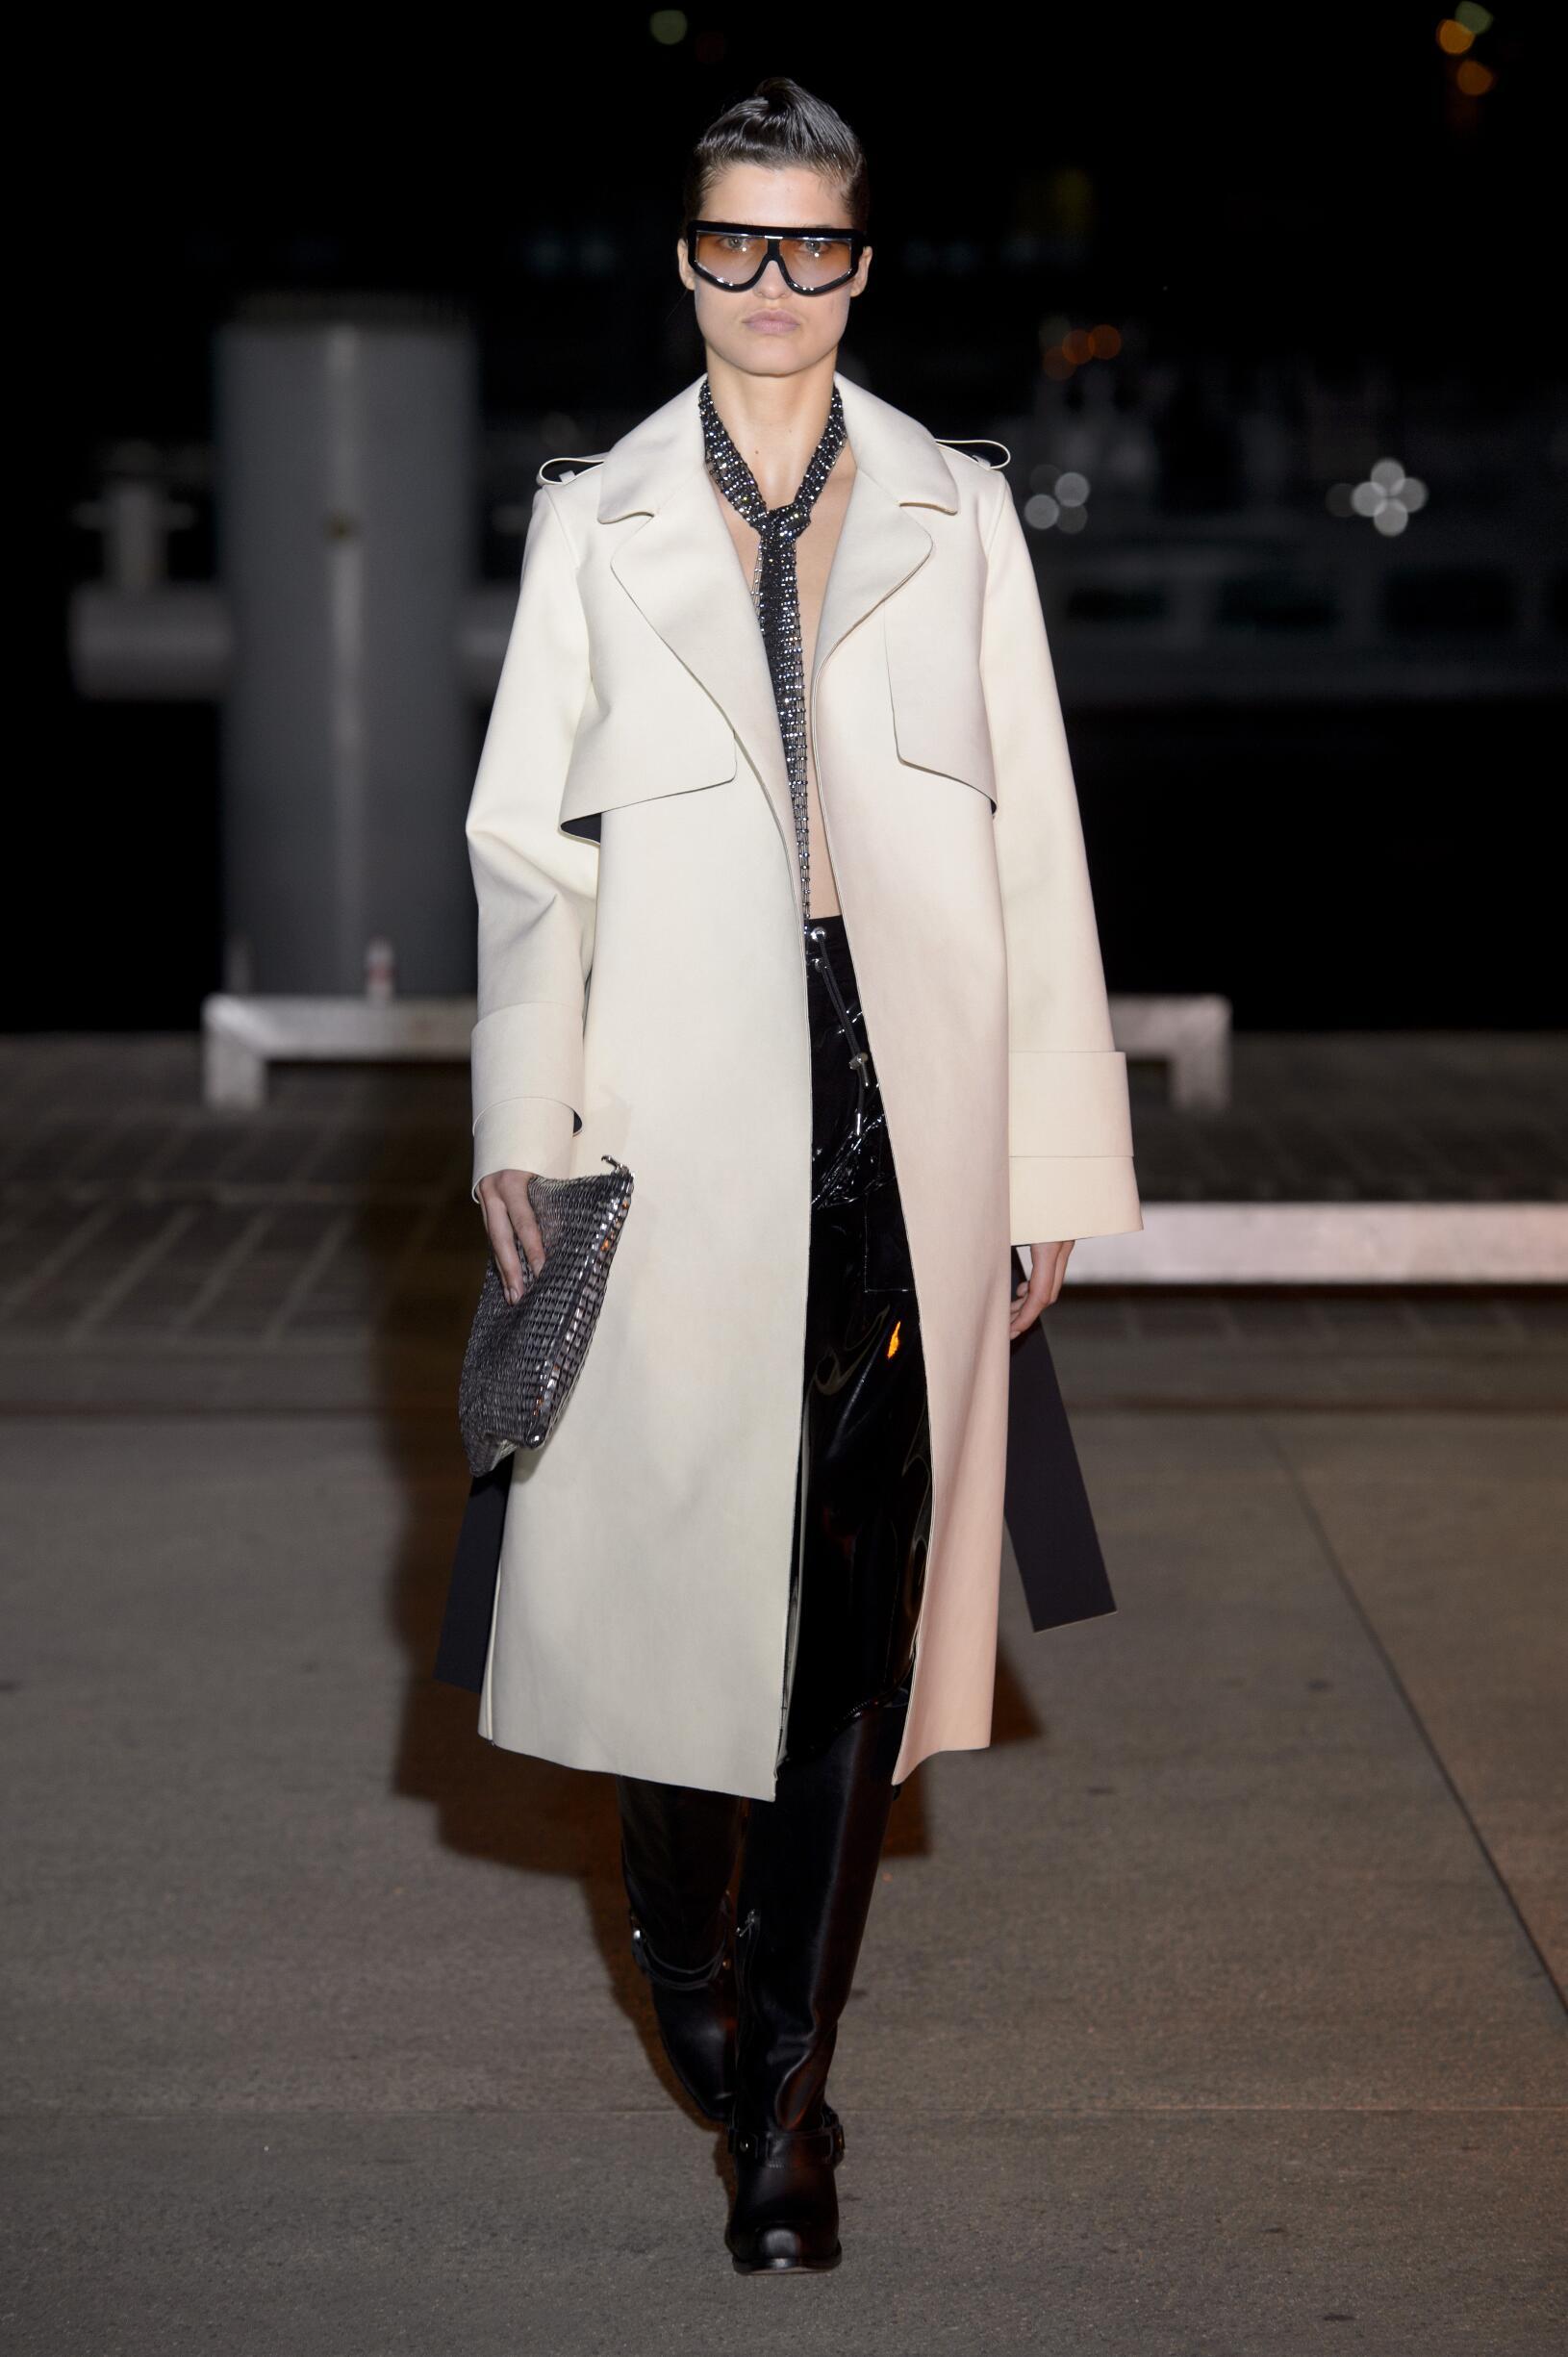 SS 2017 Wanda Nylon Fashion Show